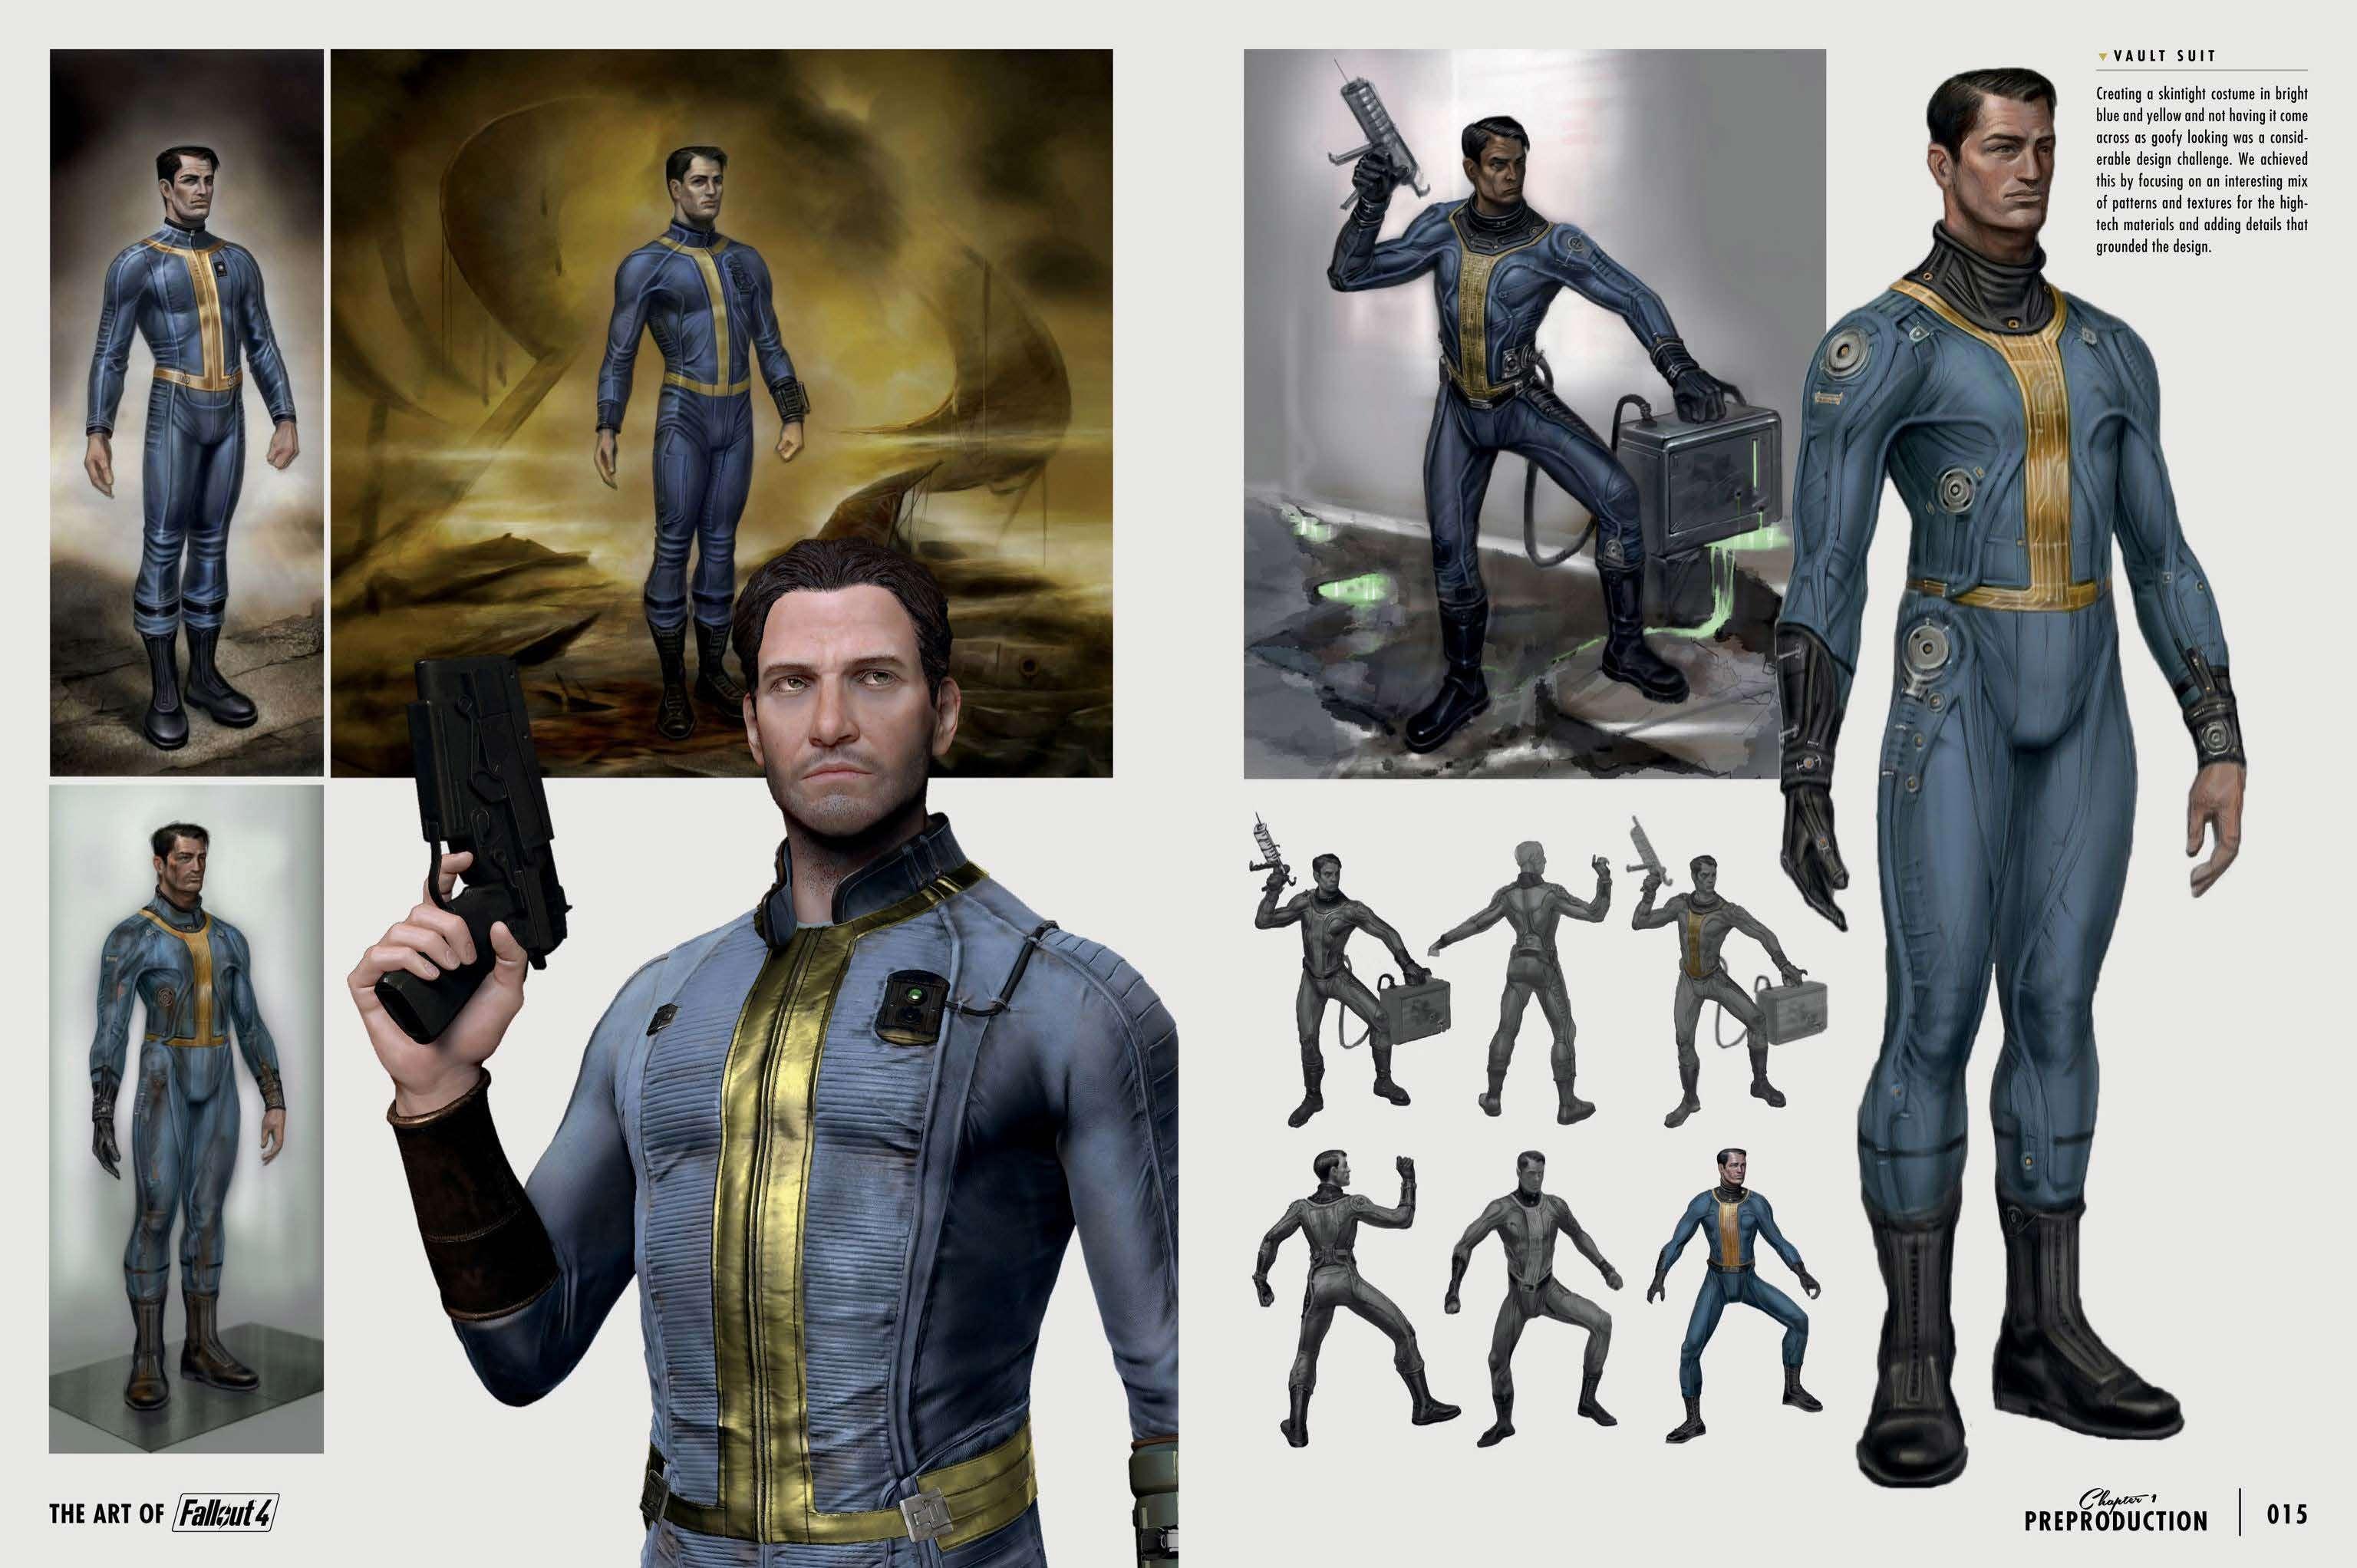 The Art of Fallout 4 - # 008 - Fallout 4 Артбук